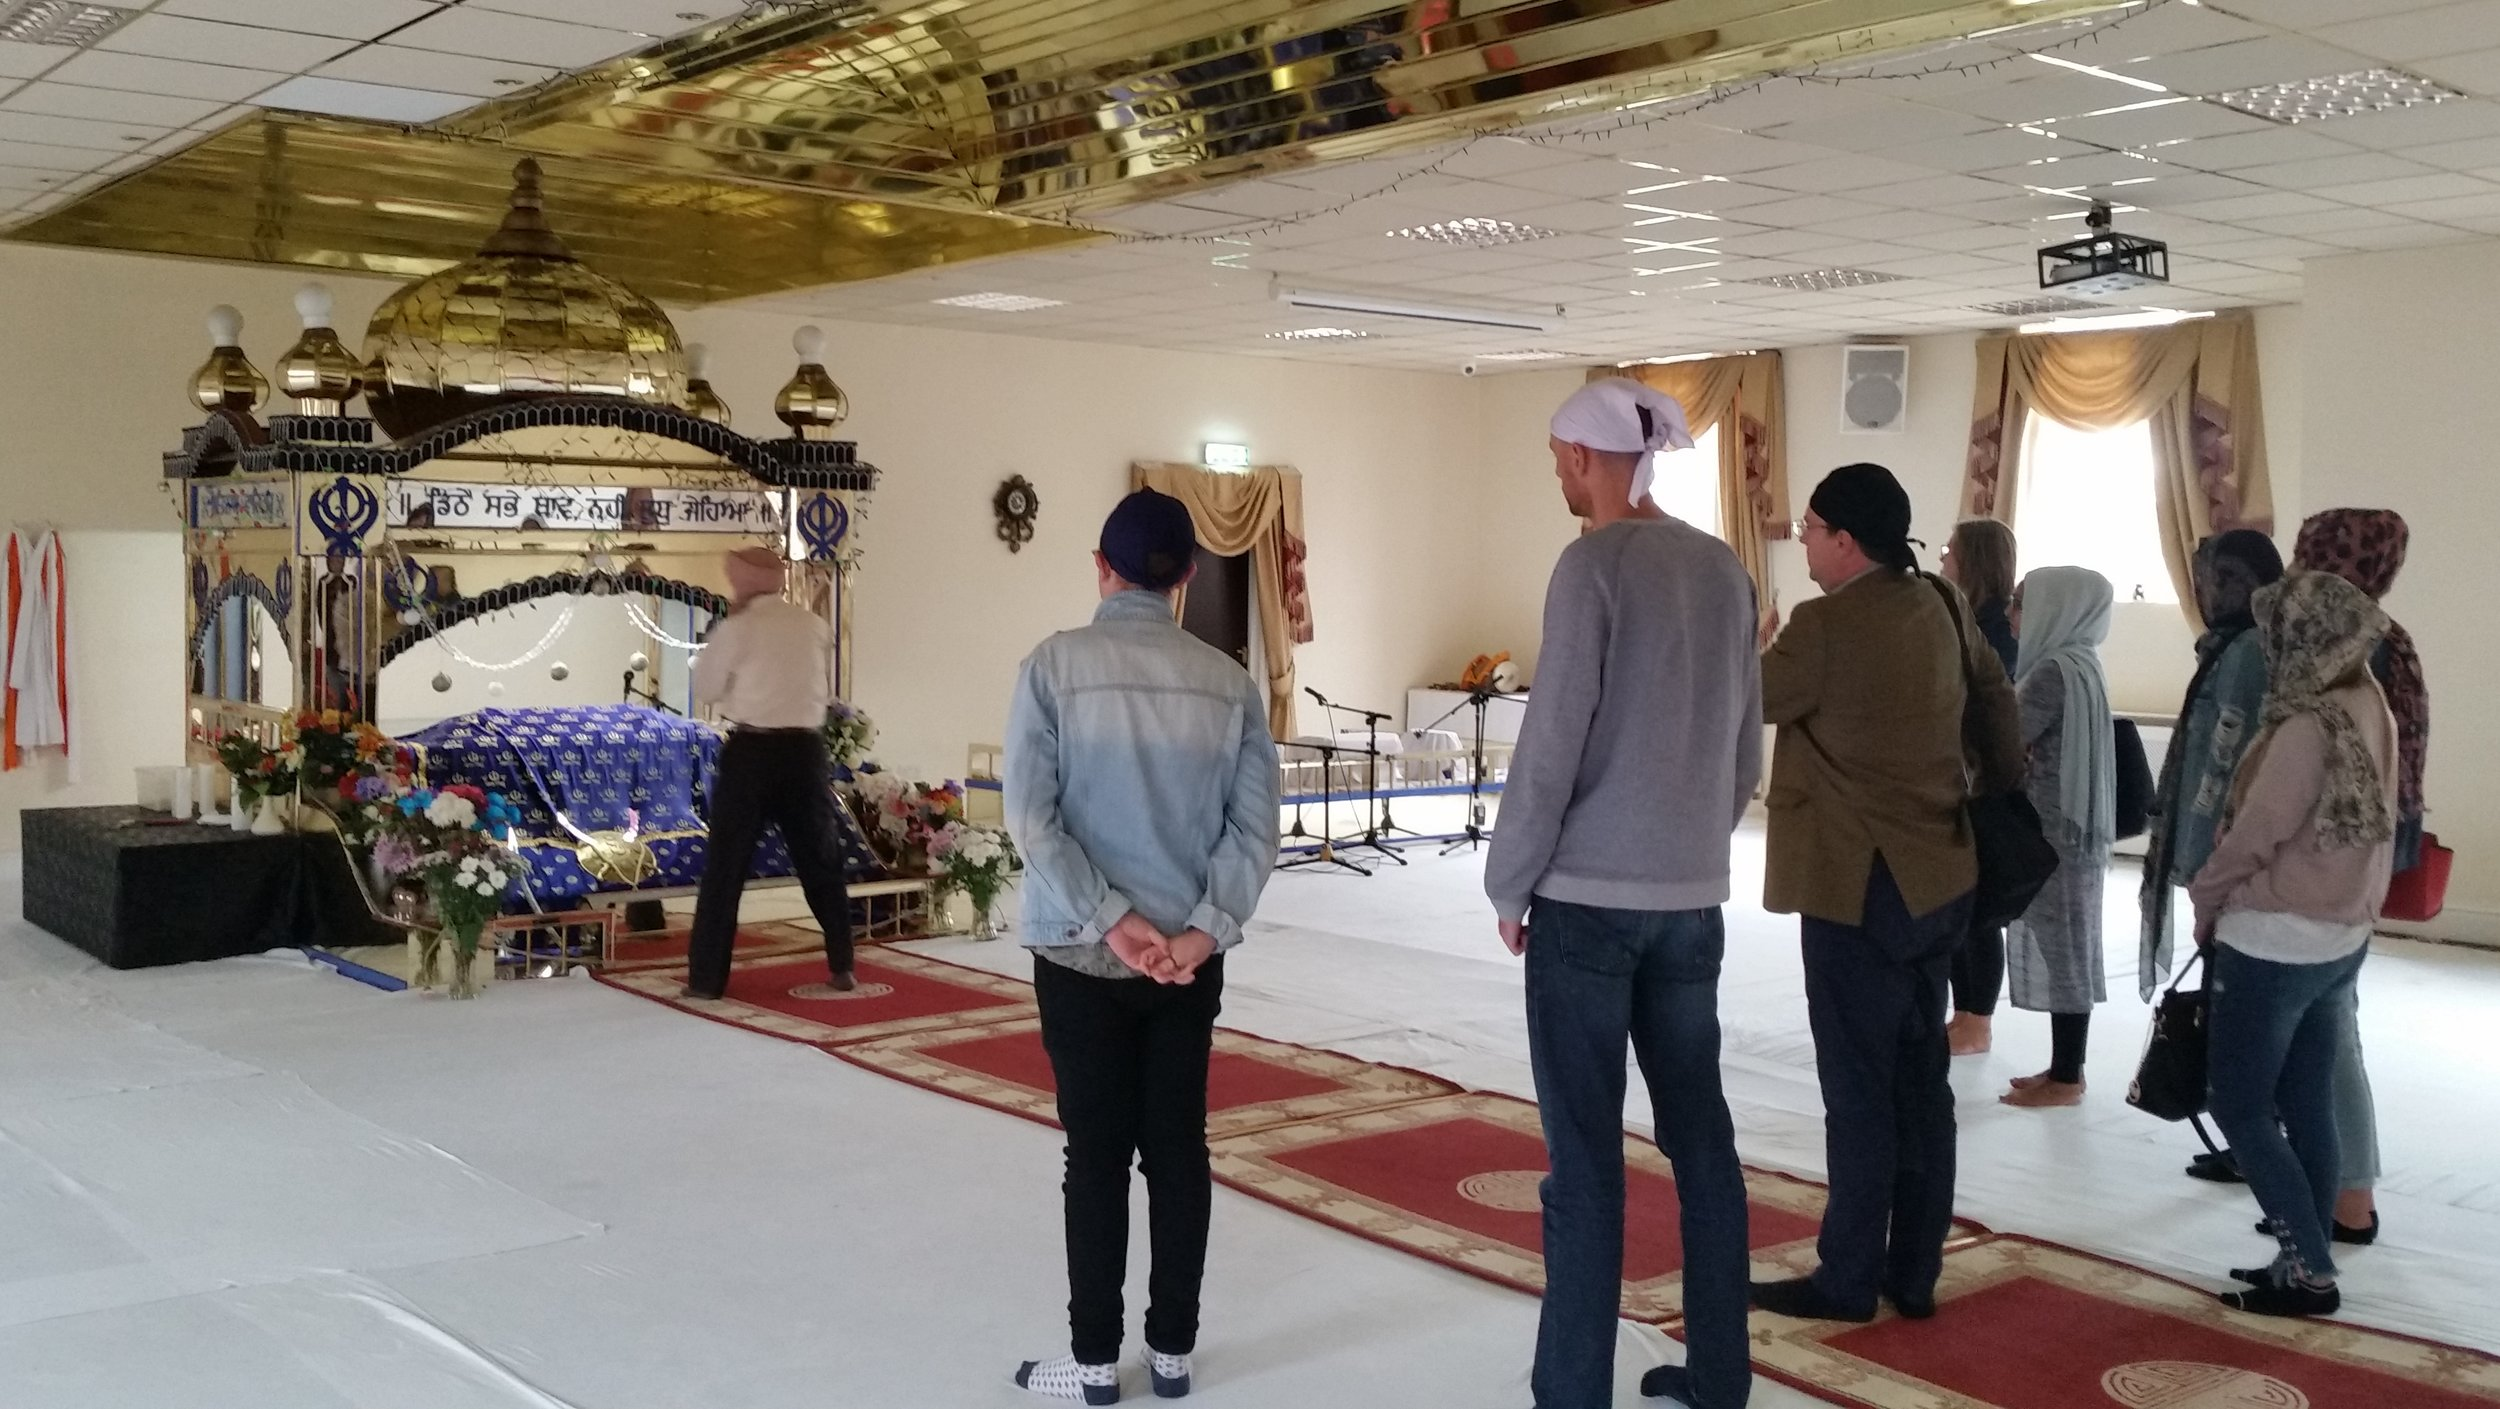 Visiting the Sikh Gurdwara